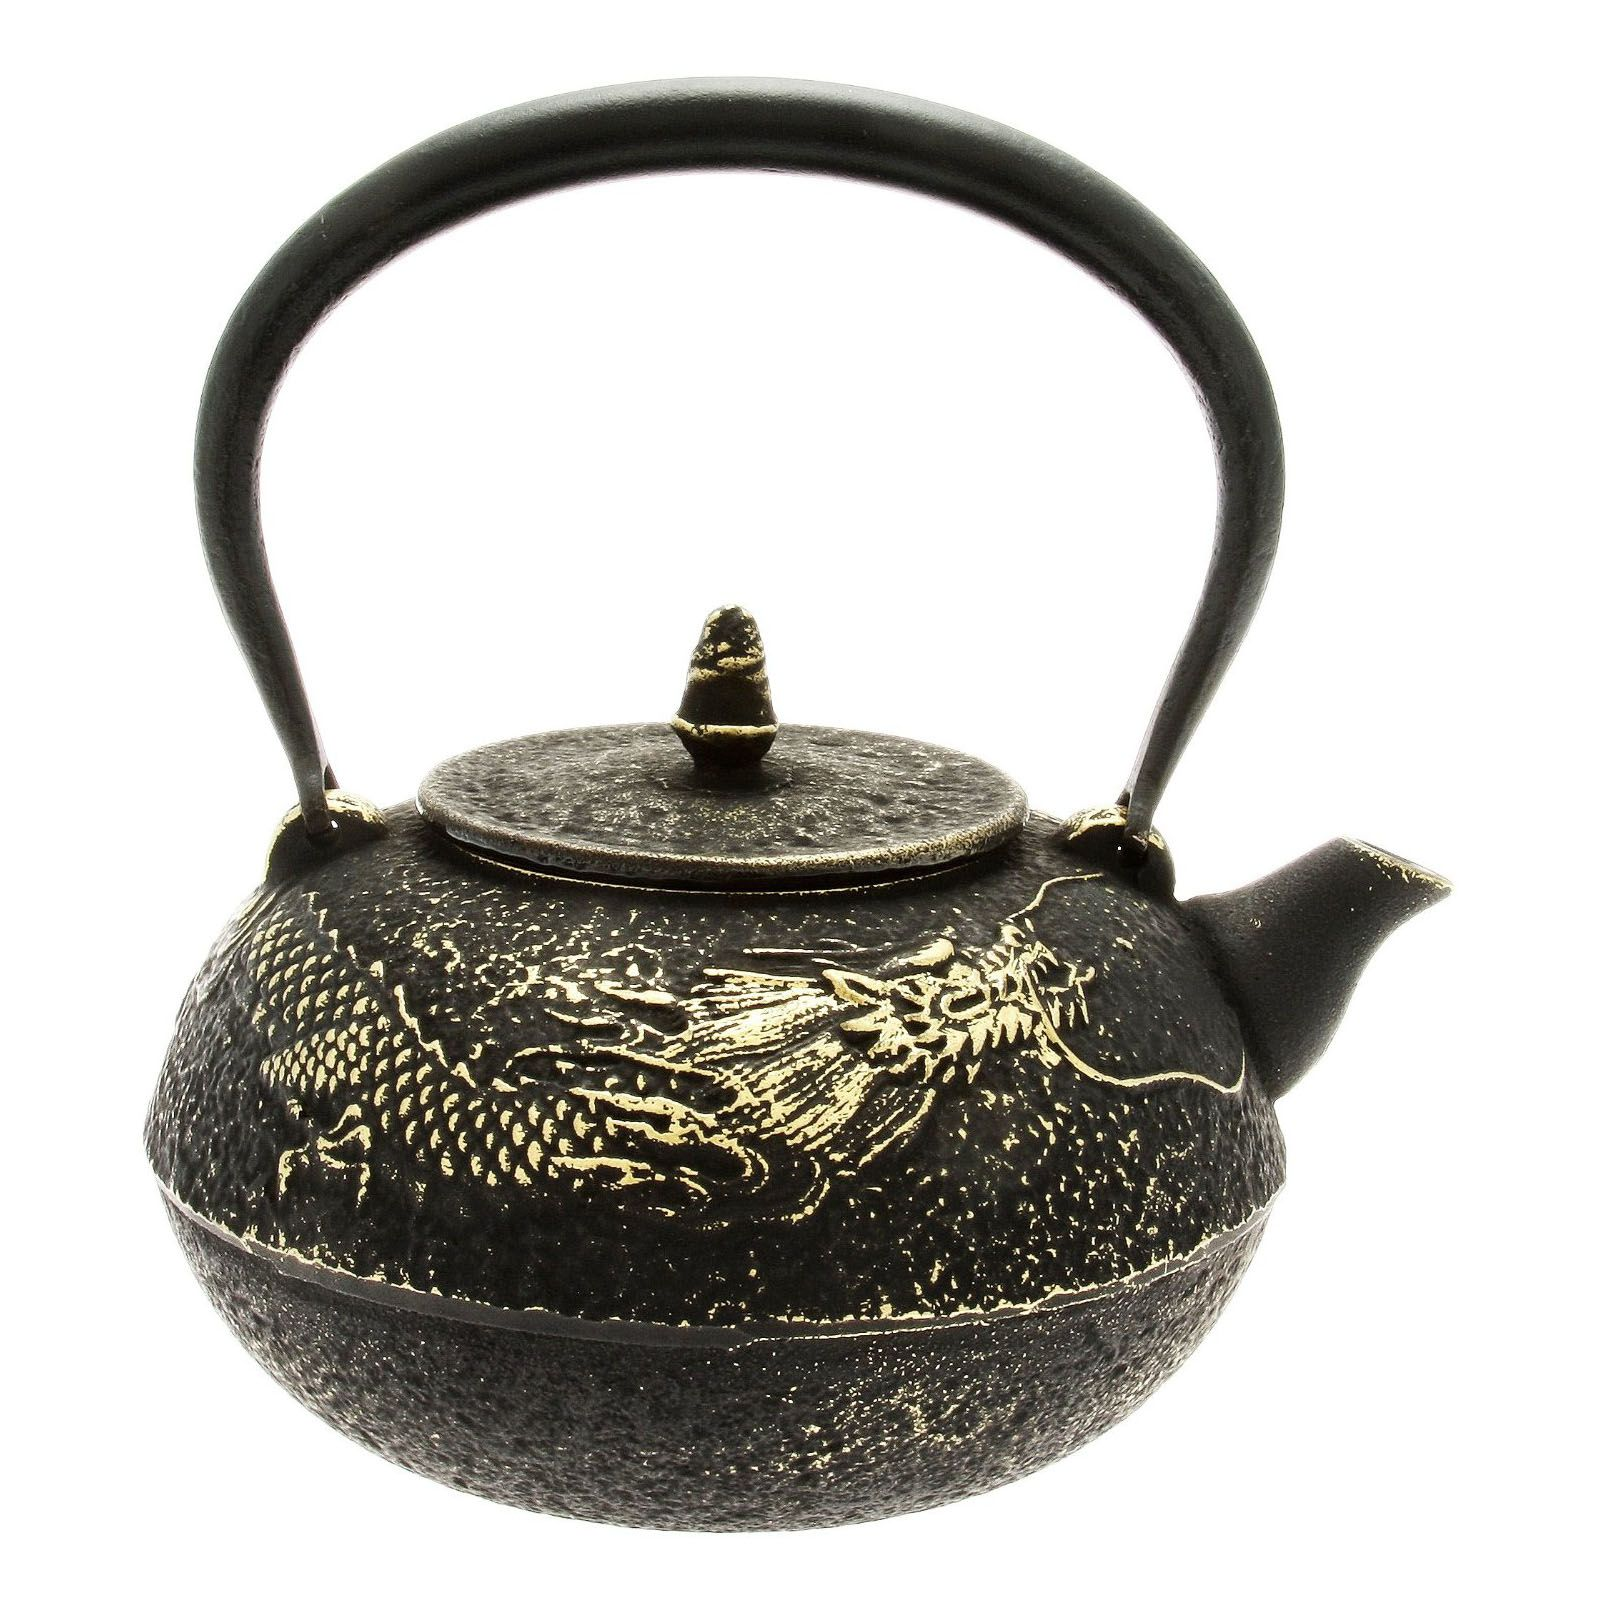 Kotobuki japanese iron teapot greycastle home goods